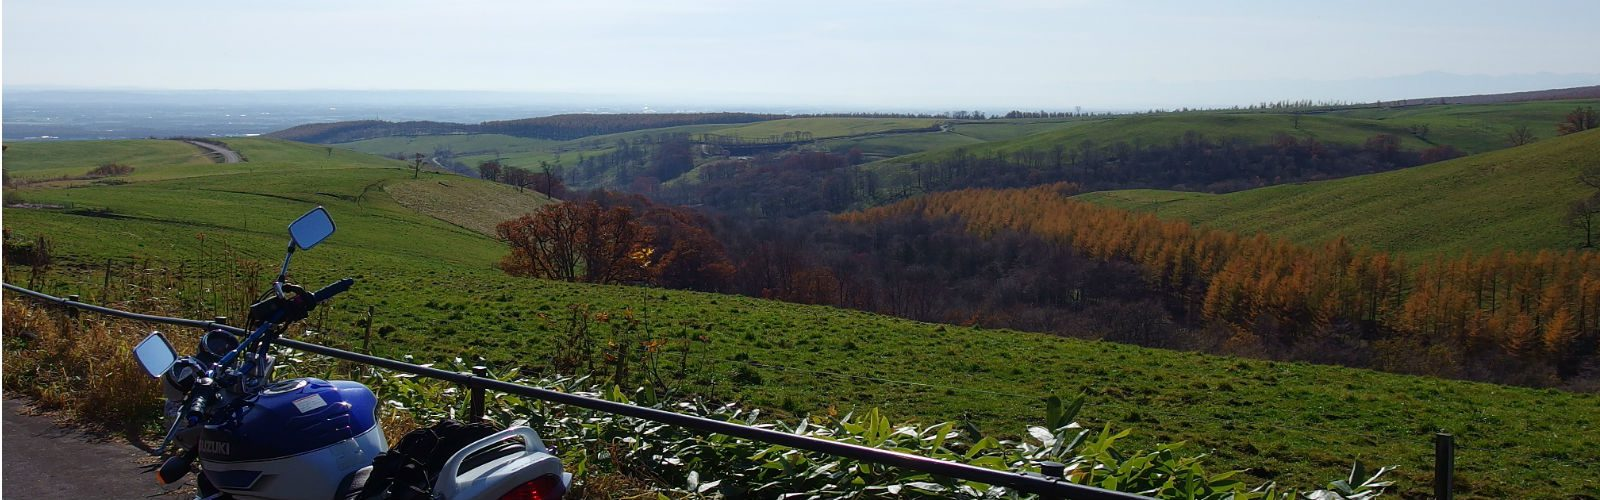 Naitai Highland Farm